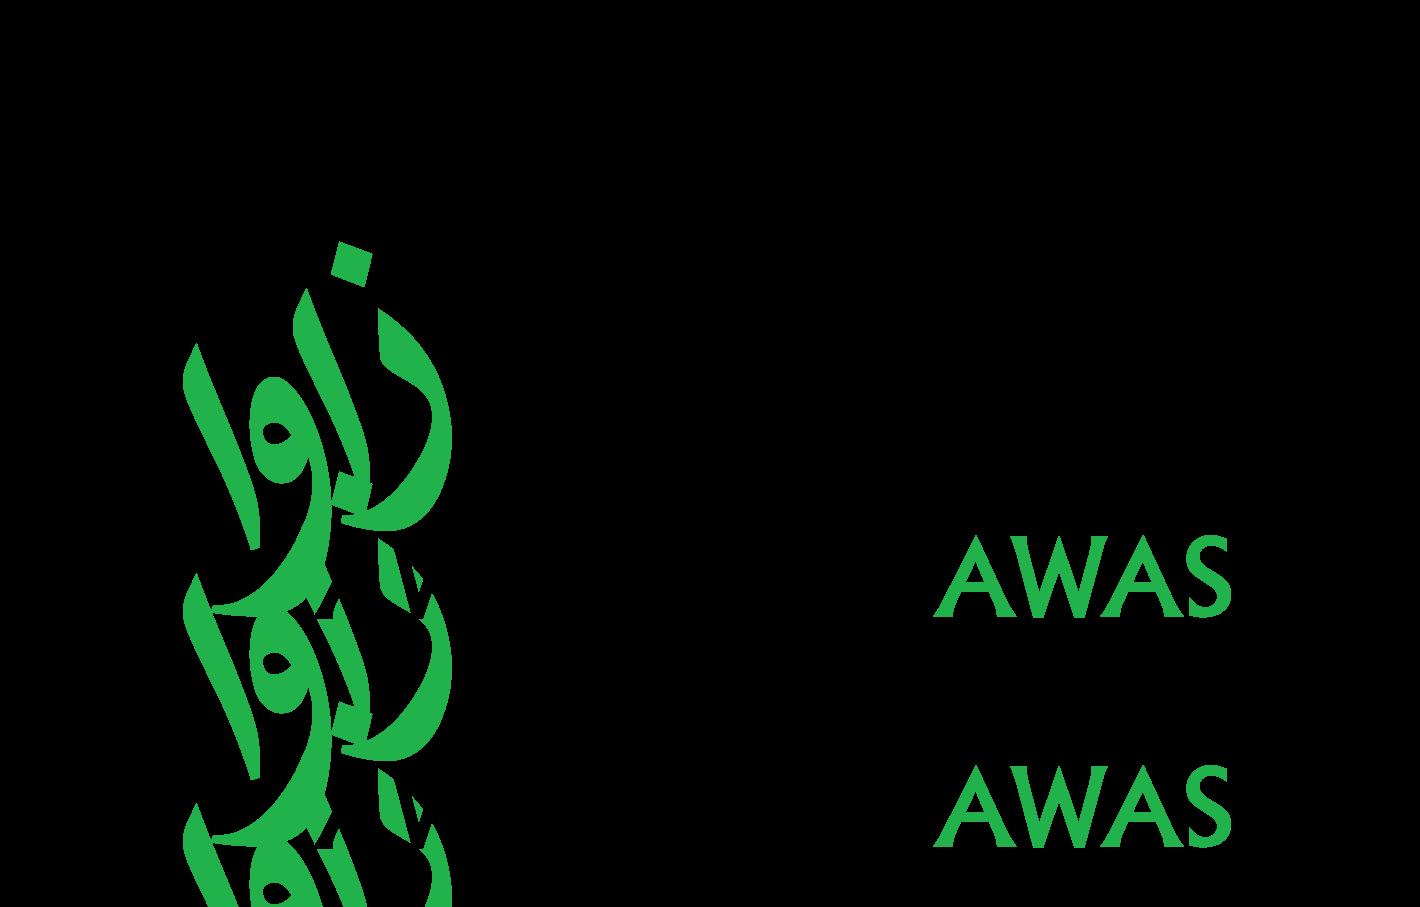 Logo Design by Private User - Entry No. 40 in the Logo Design Contest AWAS Logo Design.